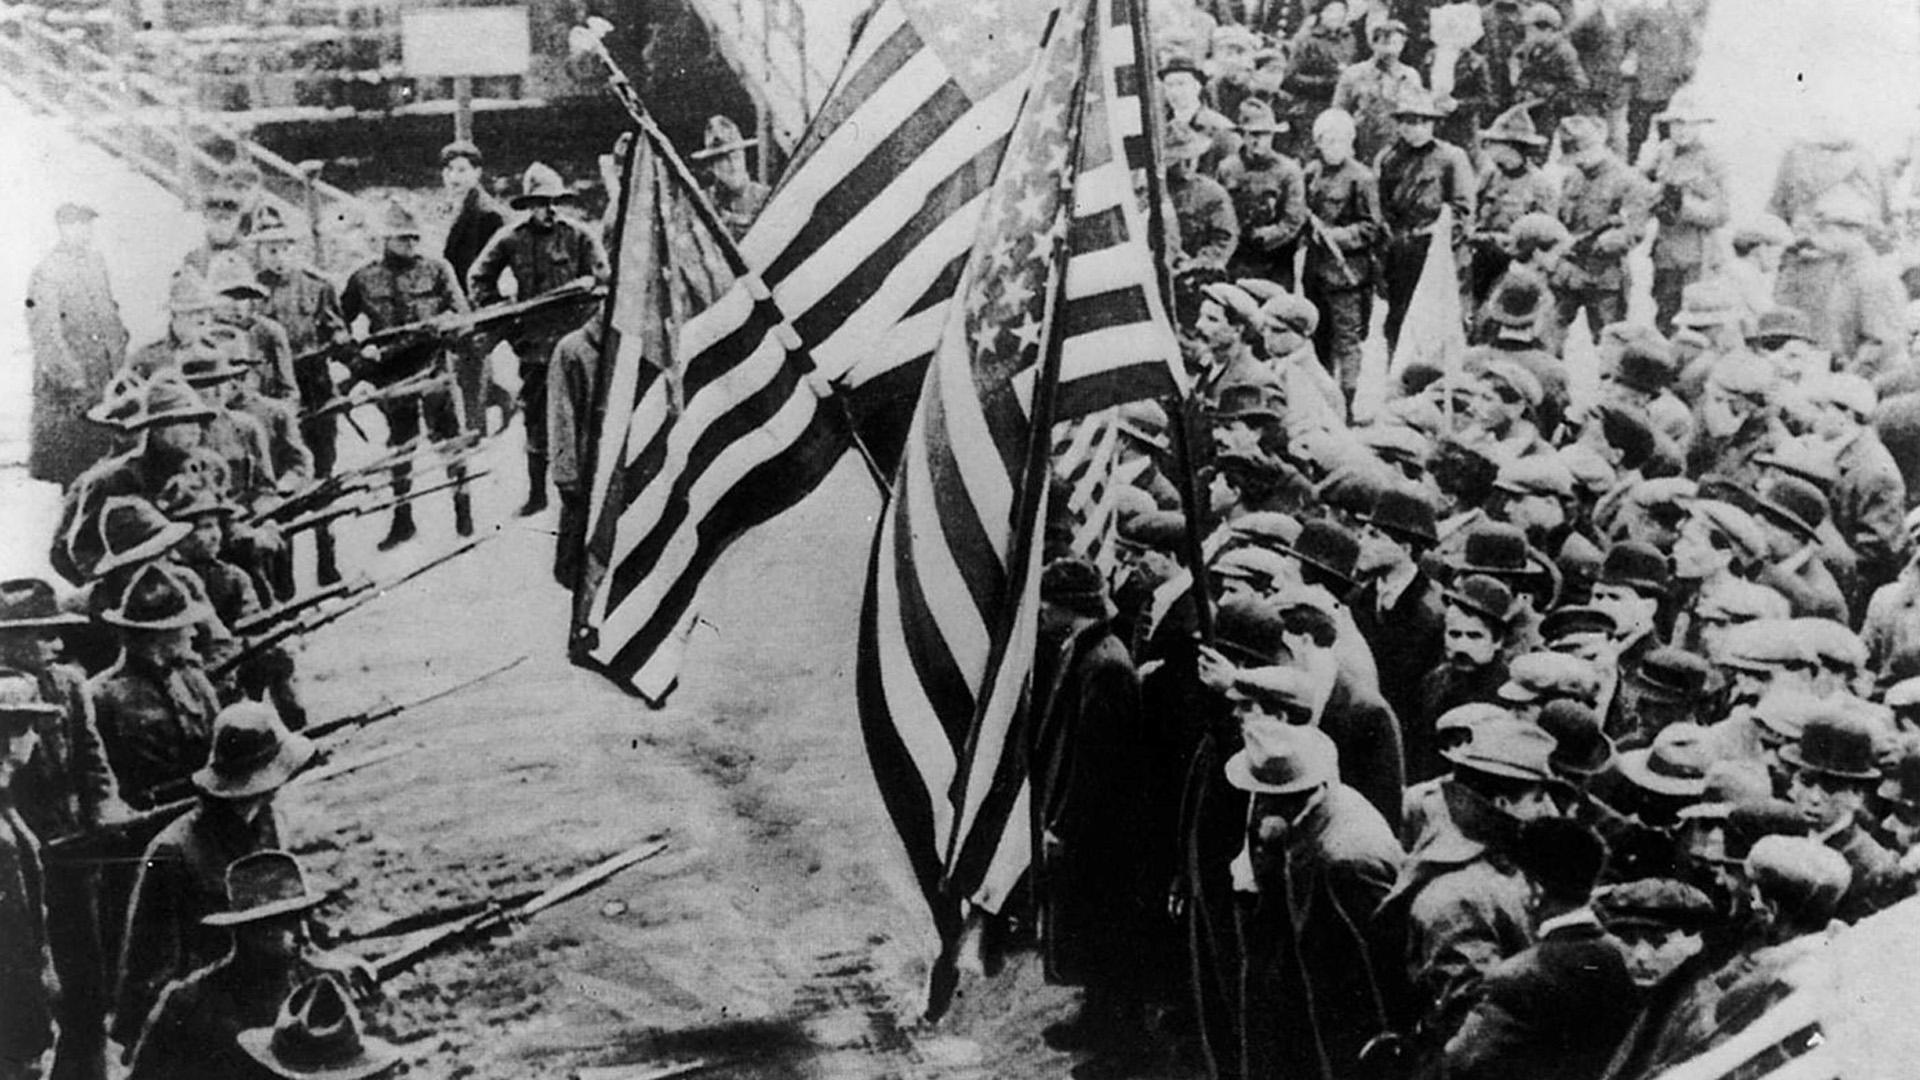 Lawrence Textile Strike, 1912